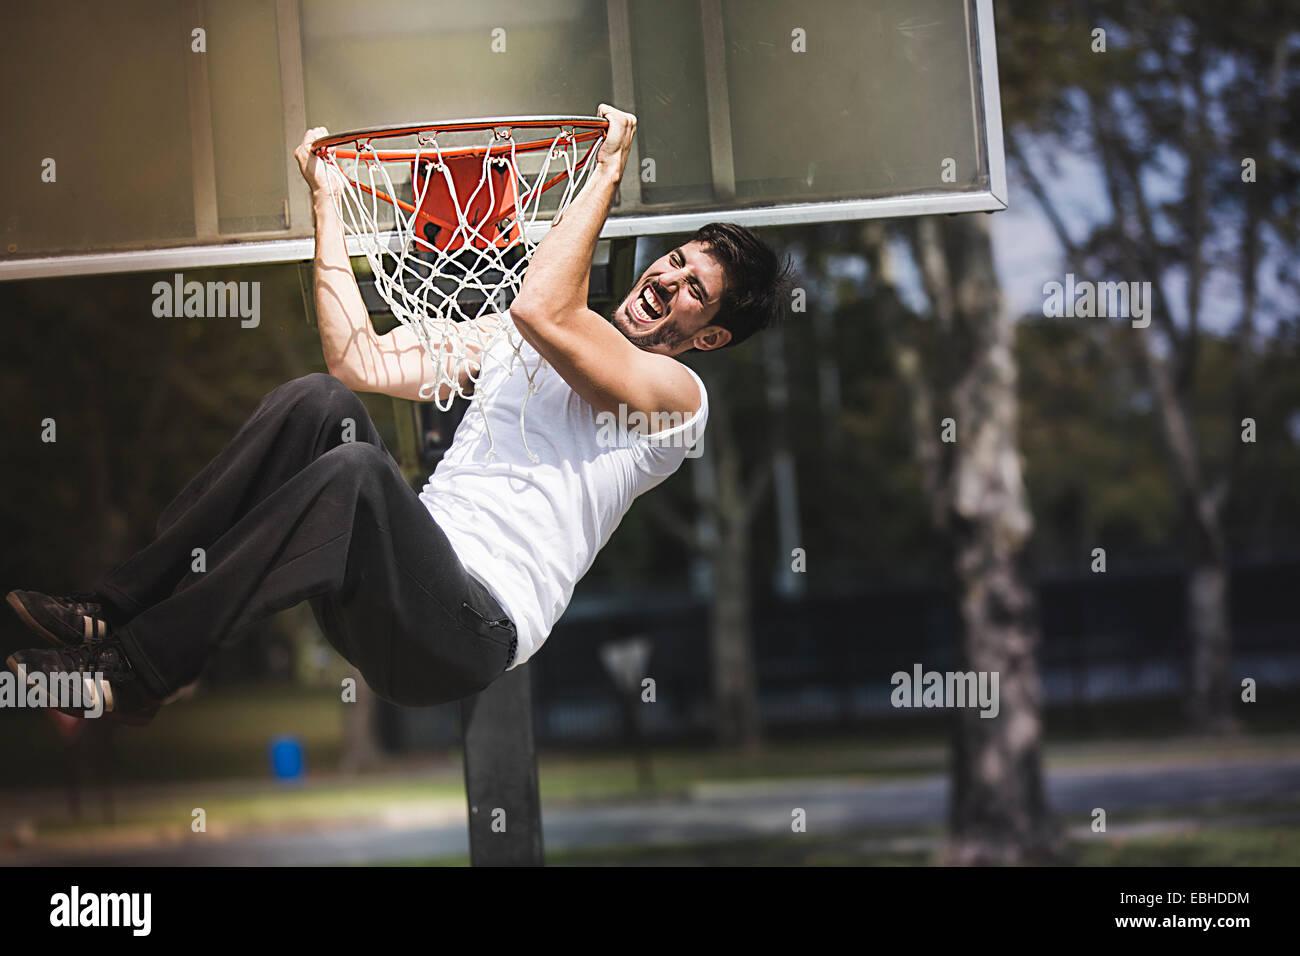 Giovane maschio basket appesi da Basketball hoop Immagini Stock